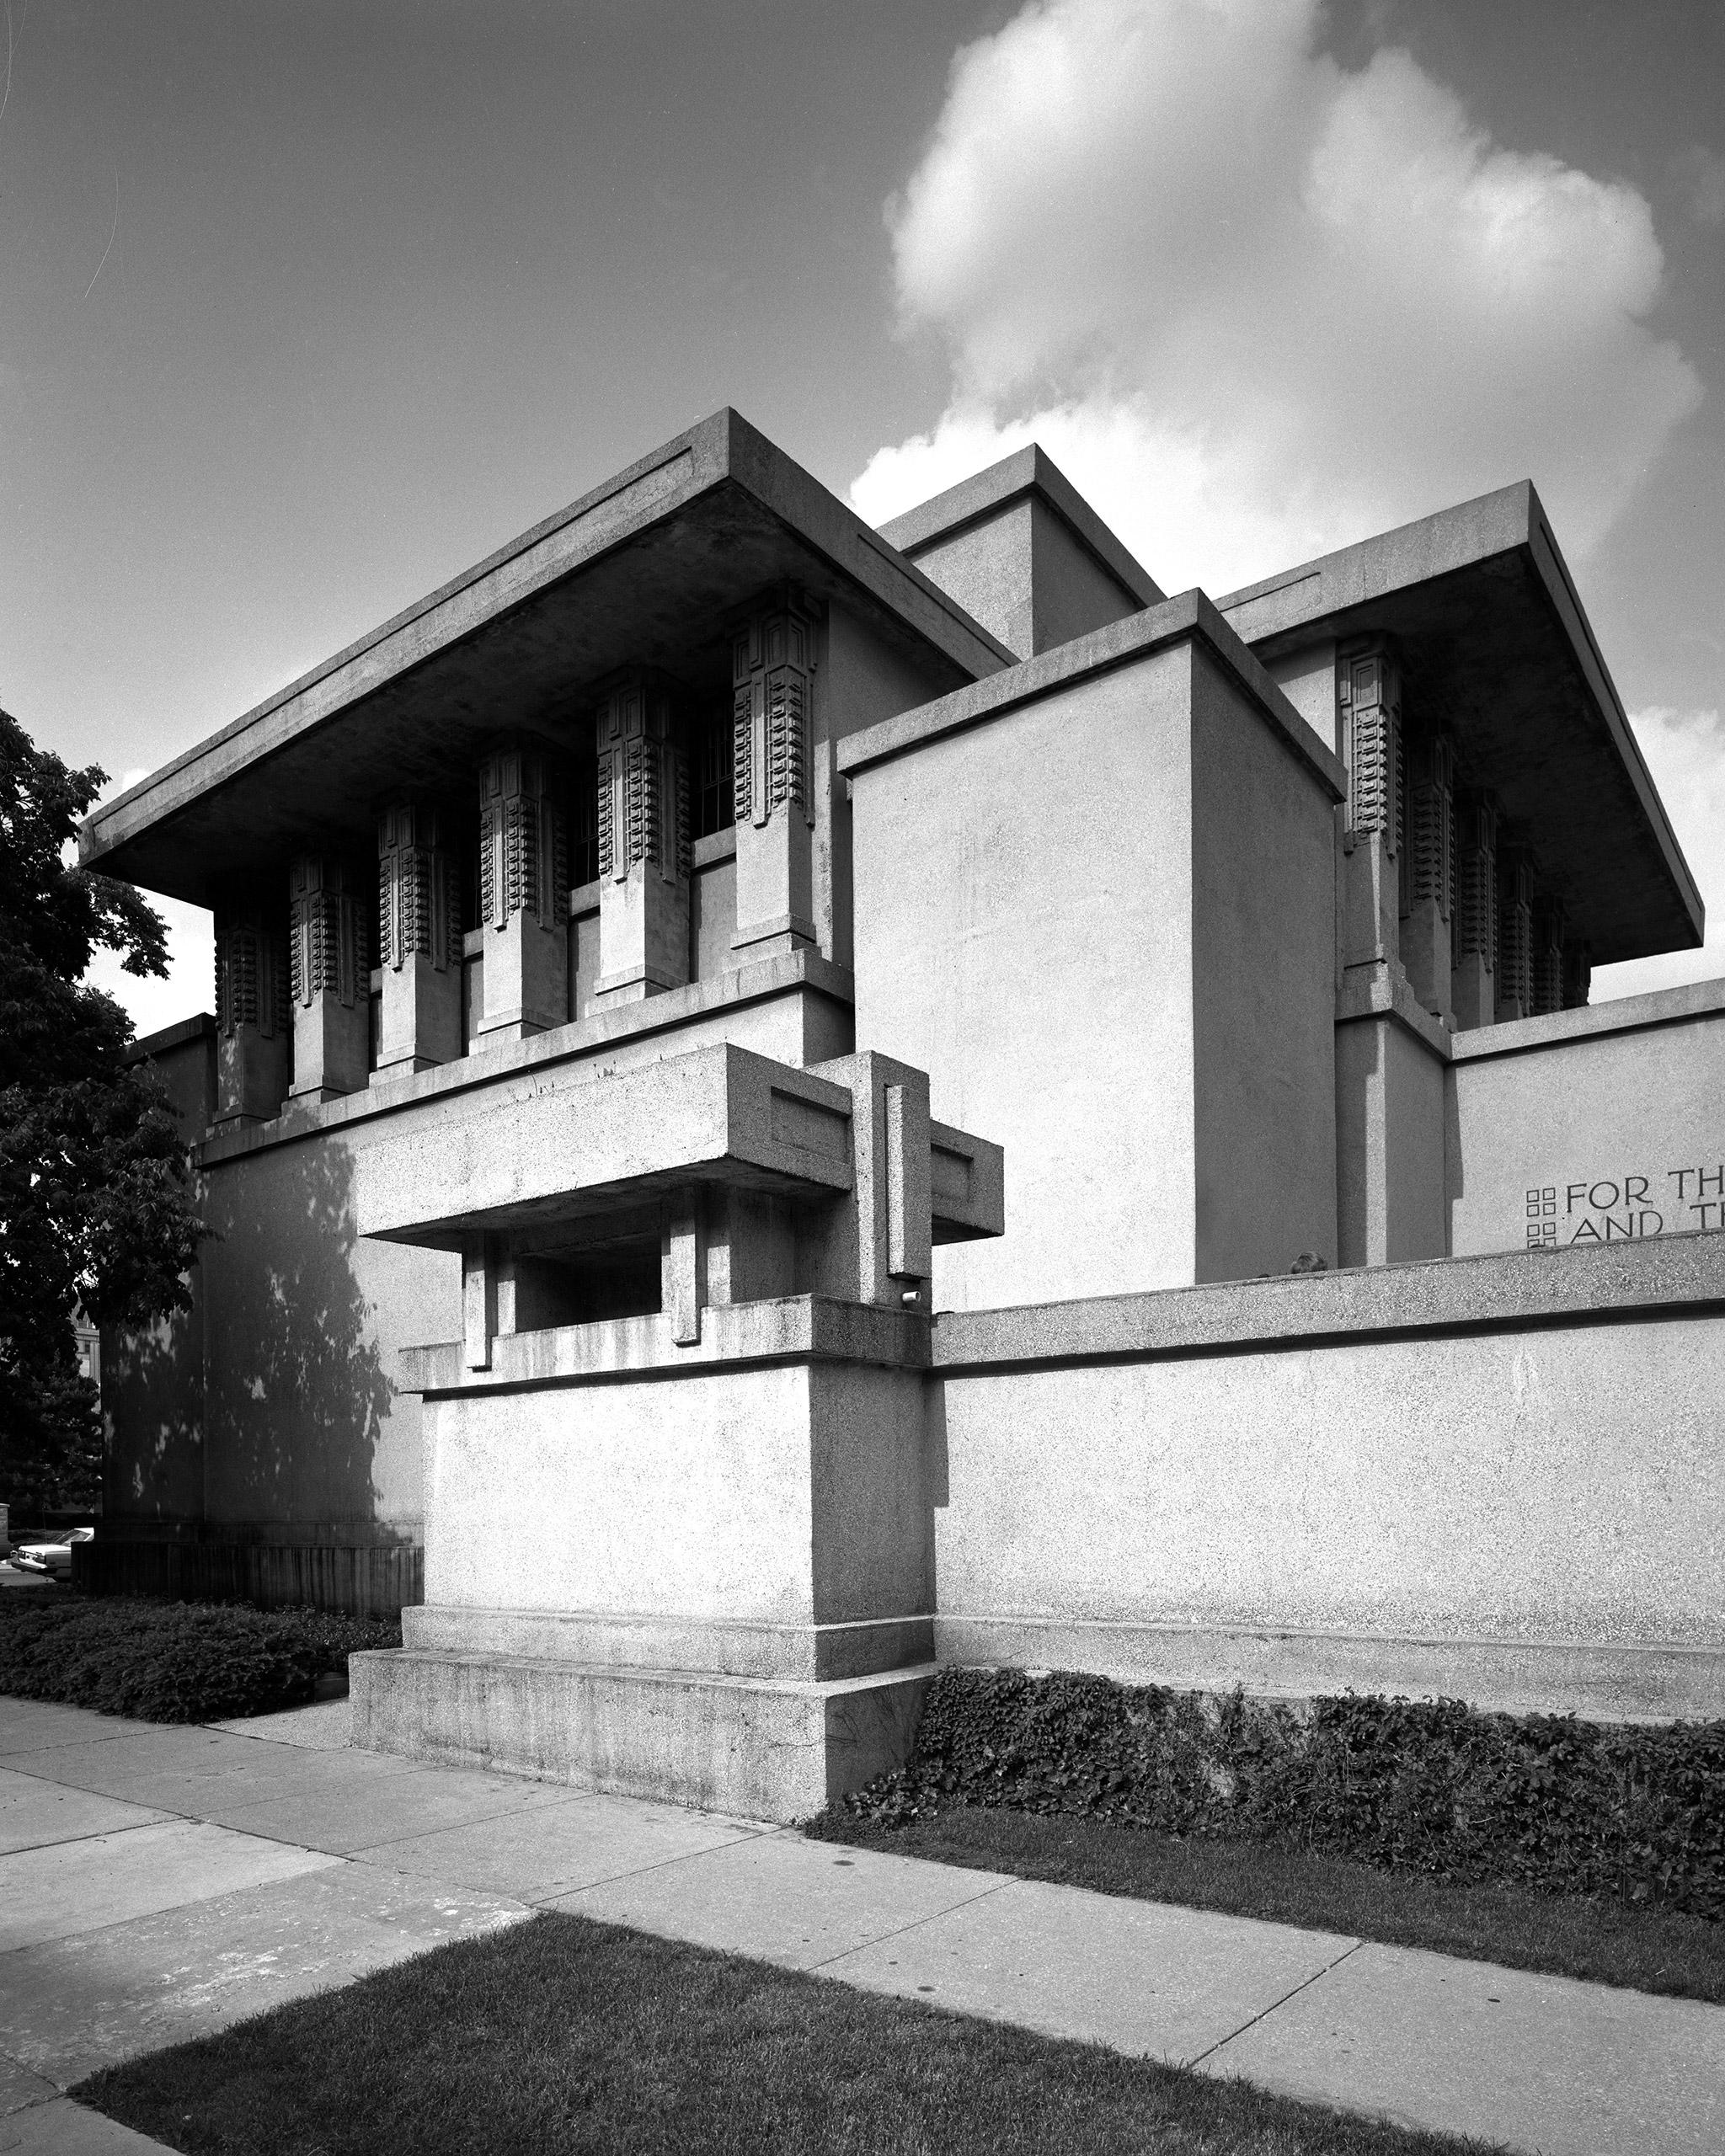 Frank Lloyd Wright's Unity Temple Church in Oak Park, Ill. Built circa 1905-1908.